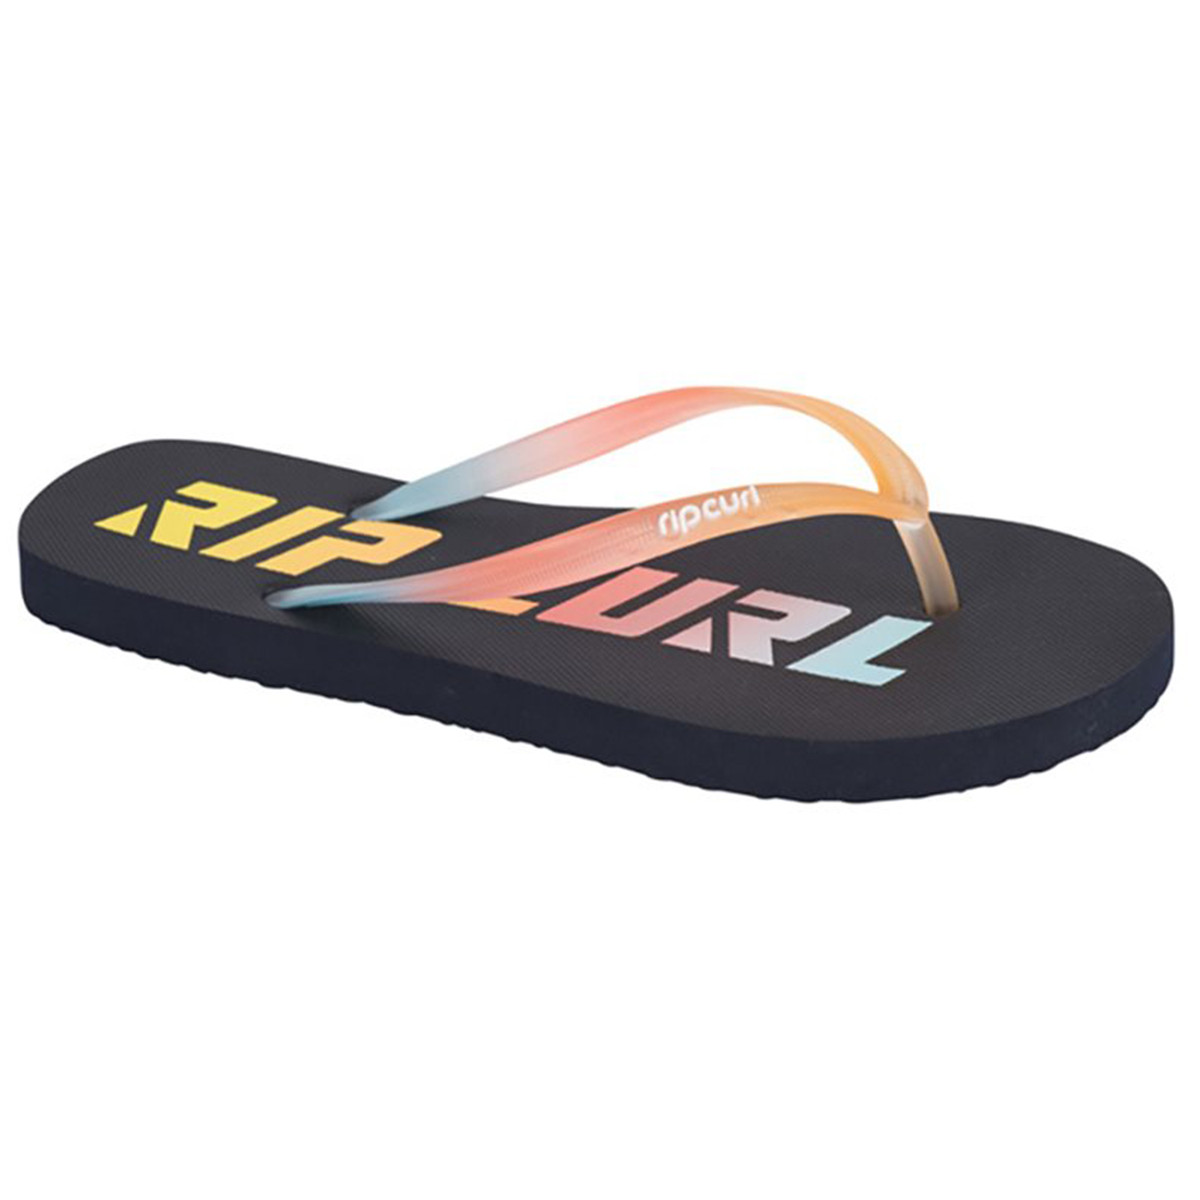 Rip Curl Tong imprimé Multicolore - Chaussures Tongs